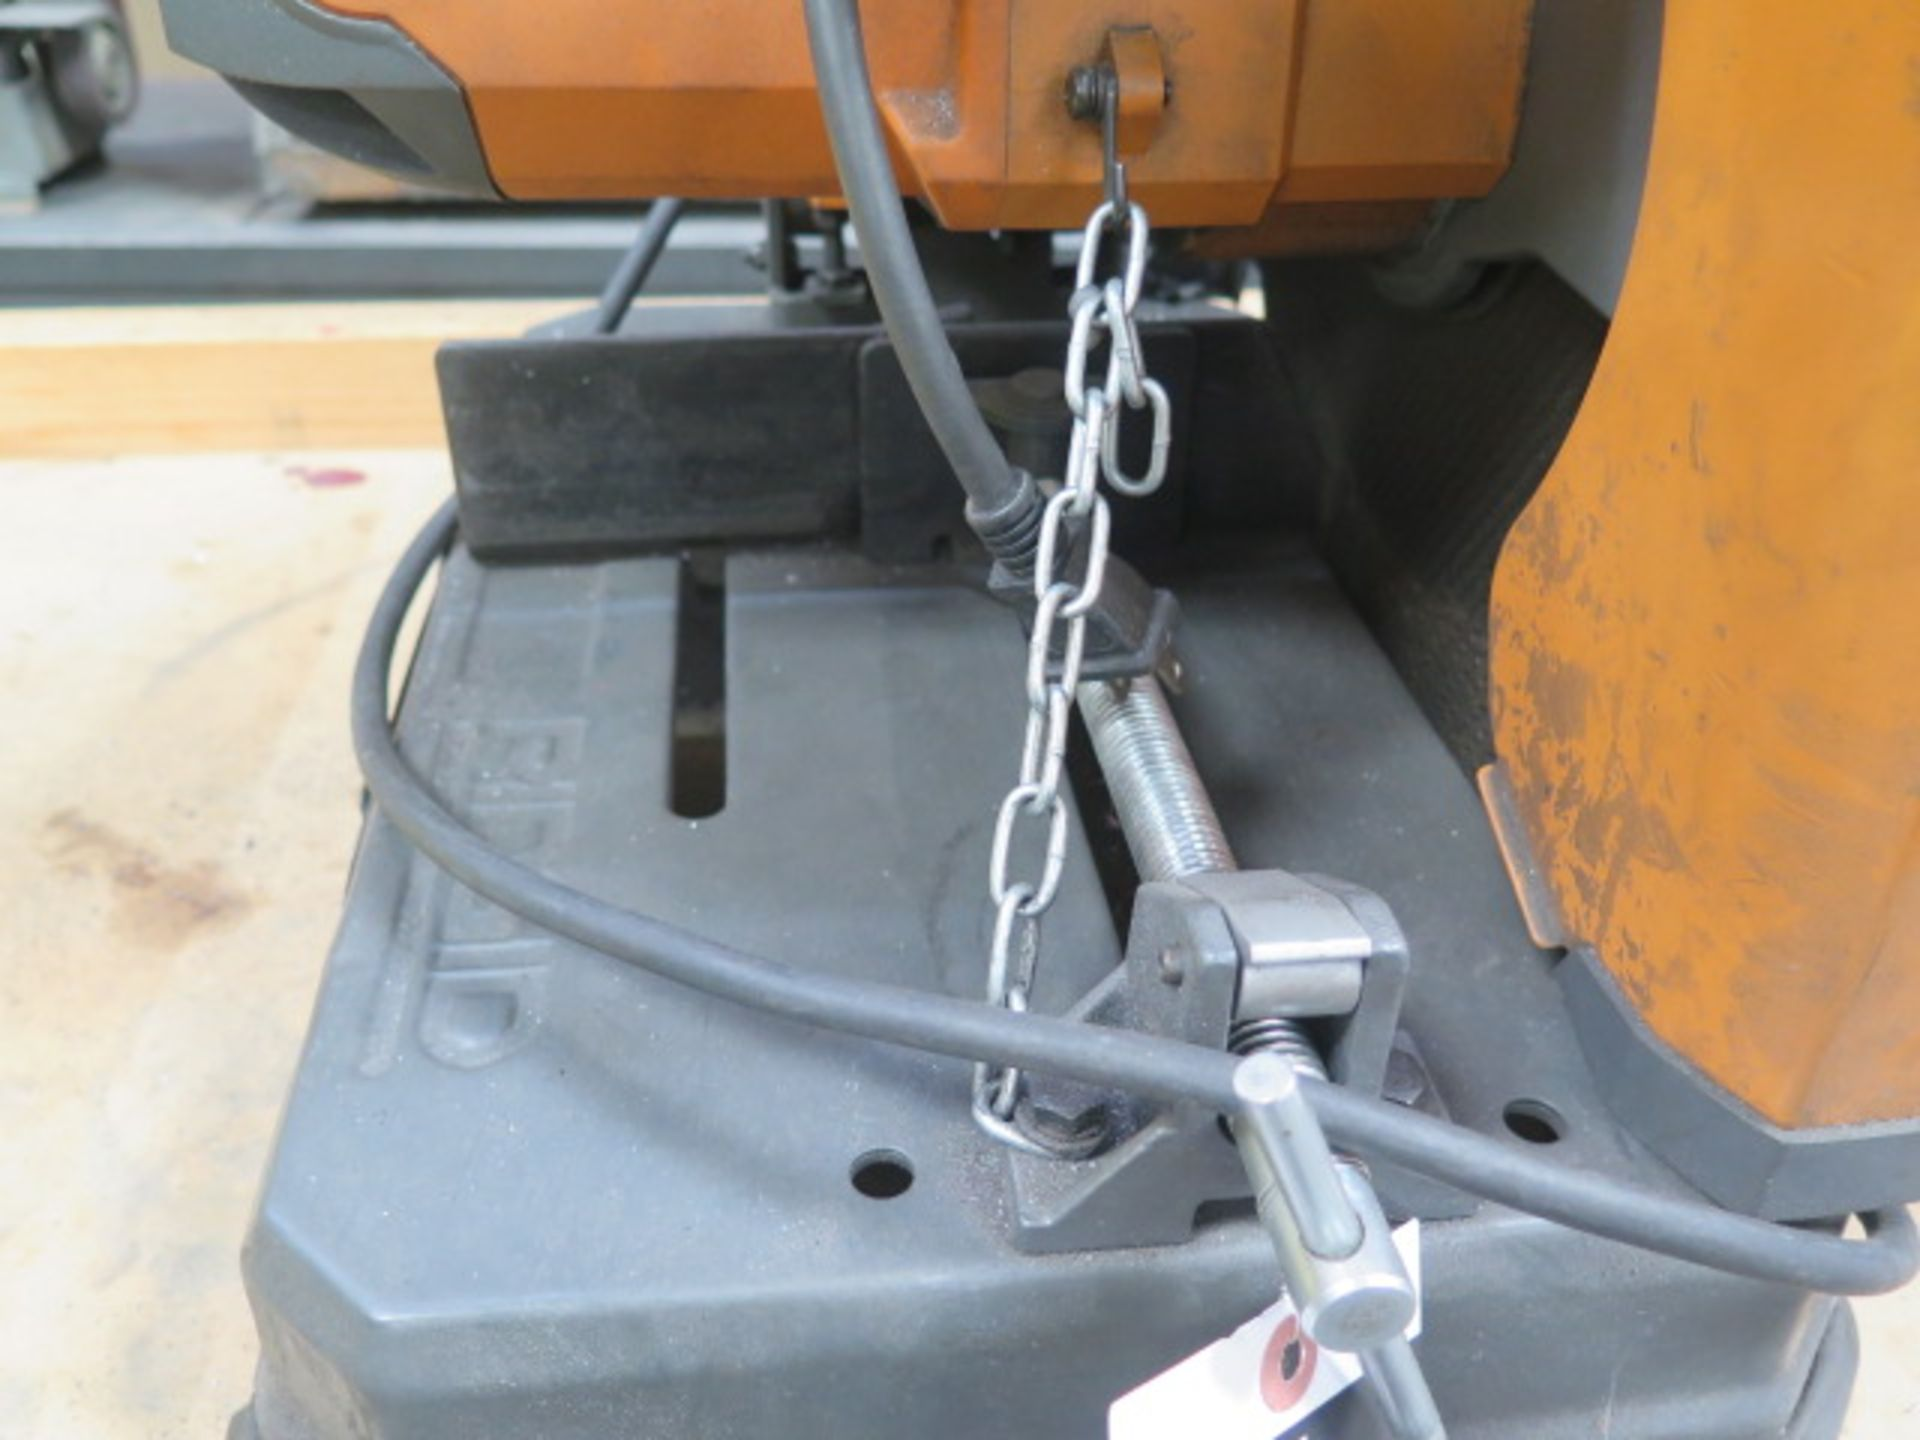 Ridgid Abrasive Cutoff Saw (SOLD AS-IS - NO WARRANTY) - Image 5 of 5